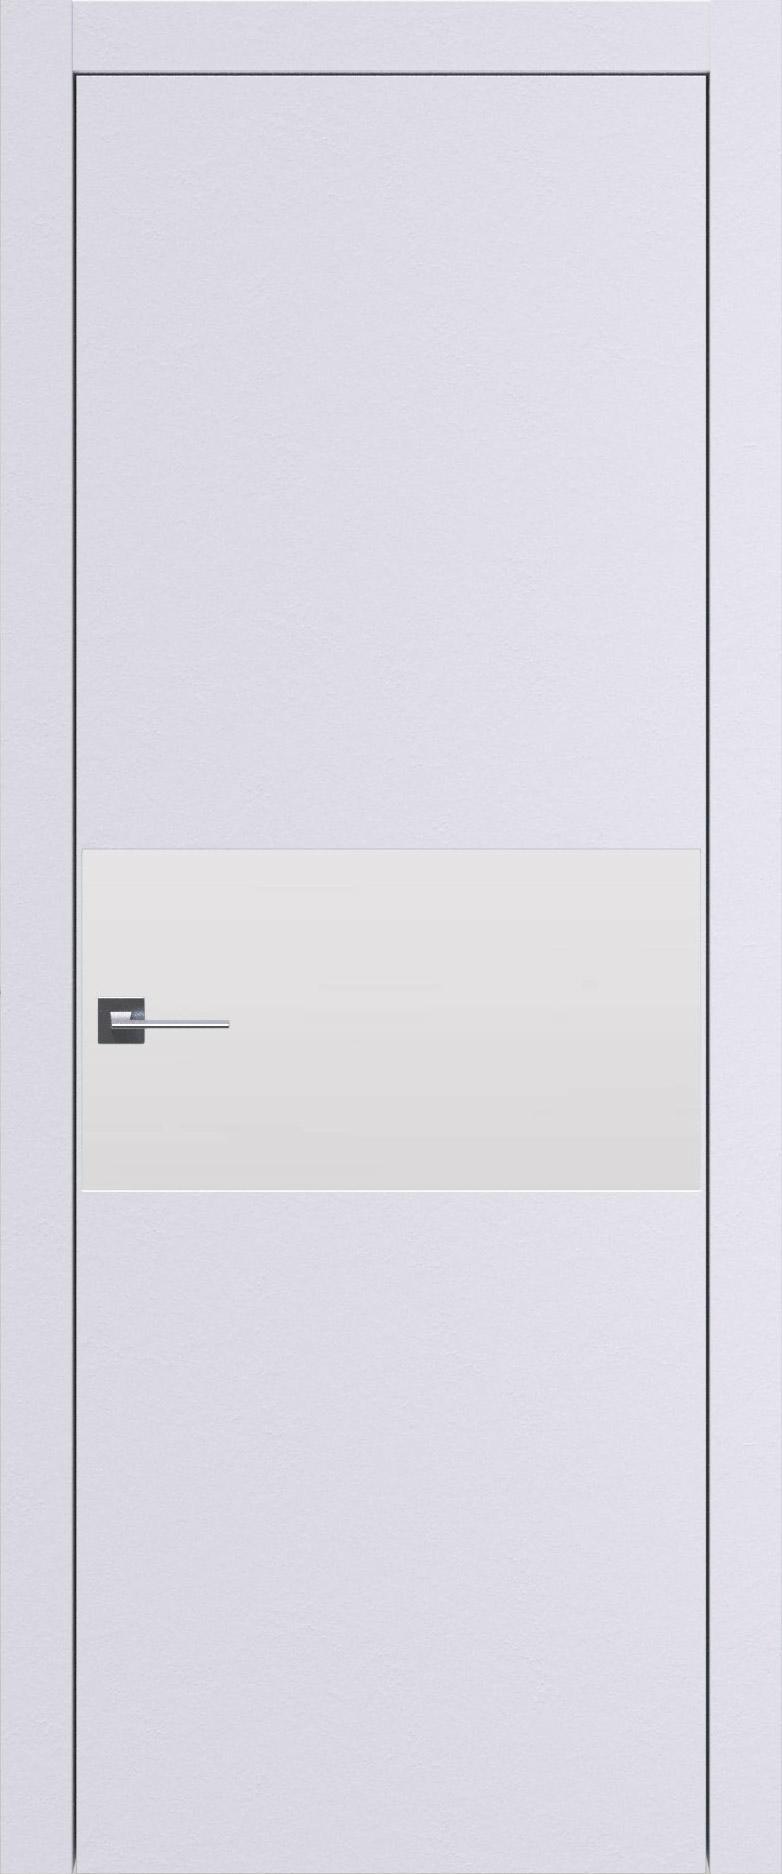 Tivoli Е-4 цвет - Арктик белый Без стекла (ДГ)